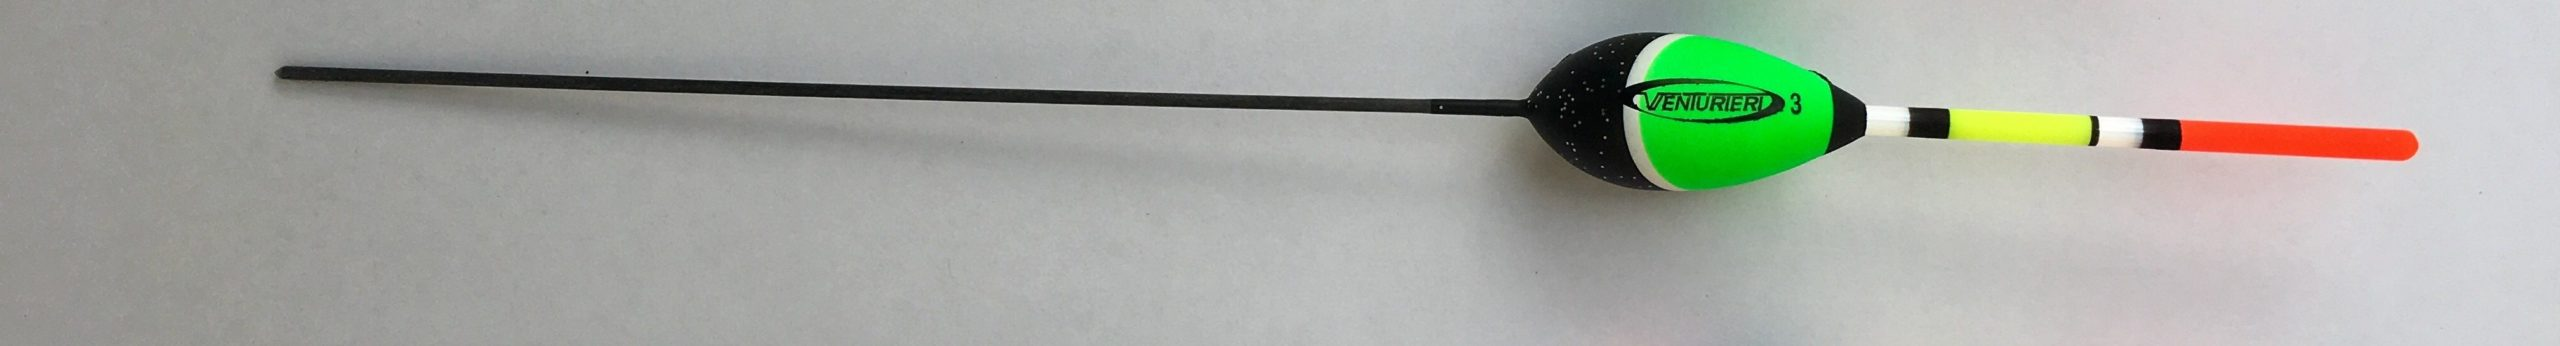 VM-07